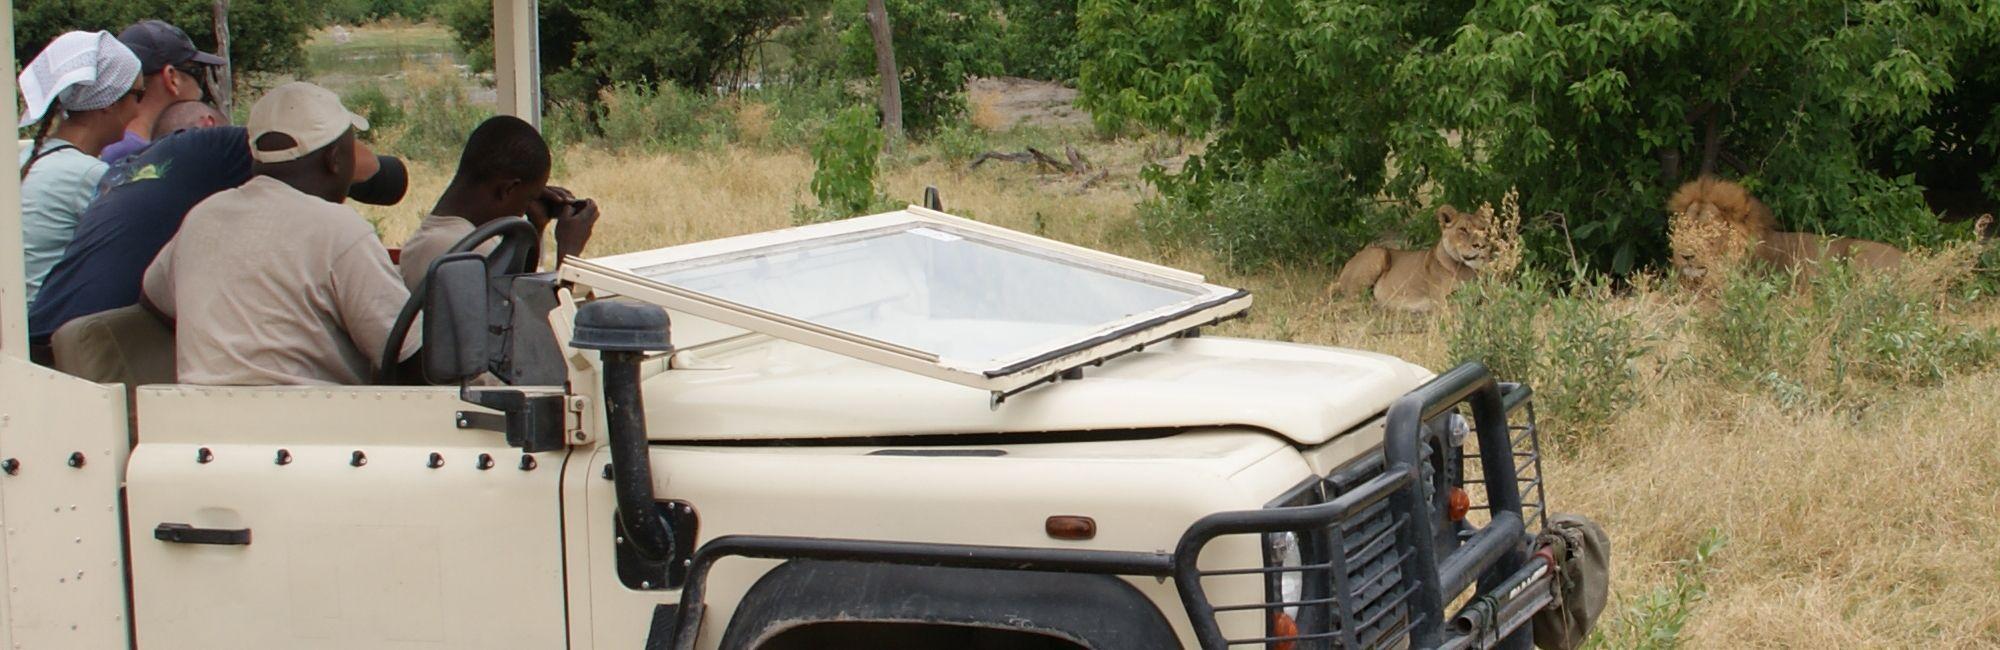 Kampeersafari Botswana Effectief